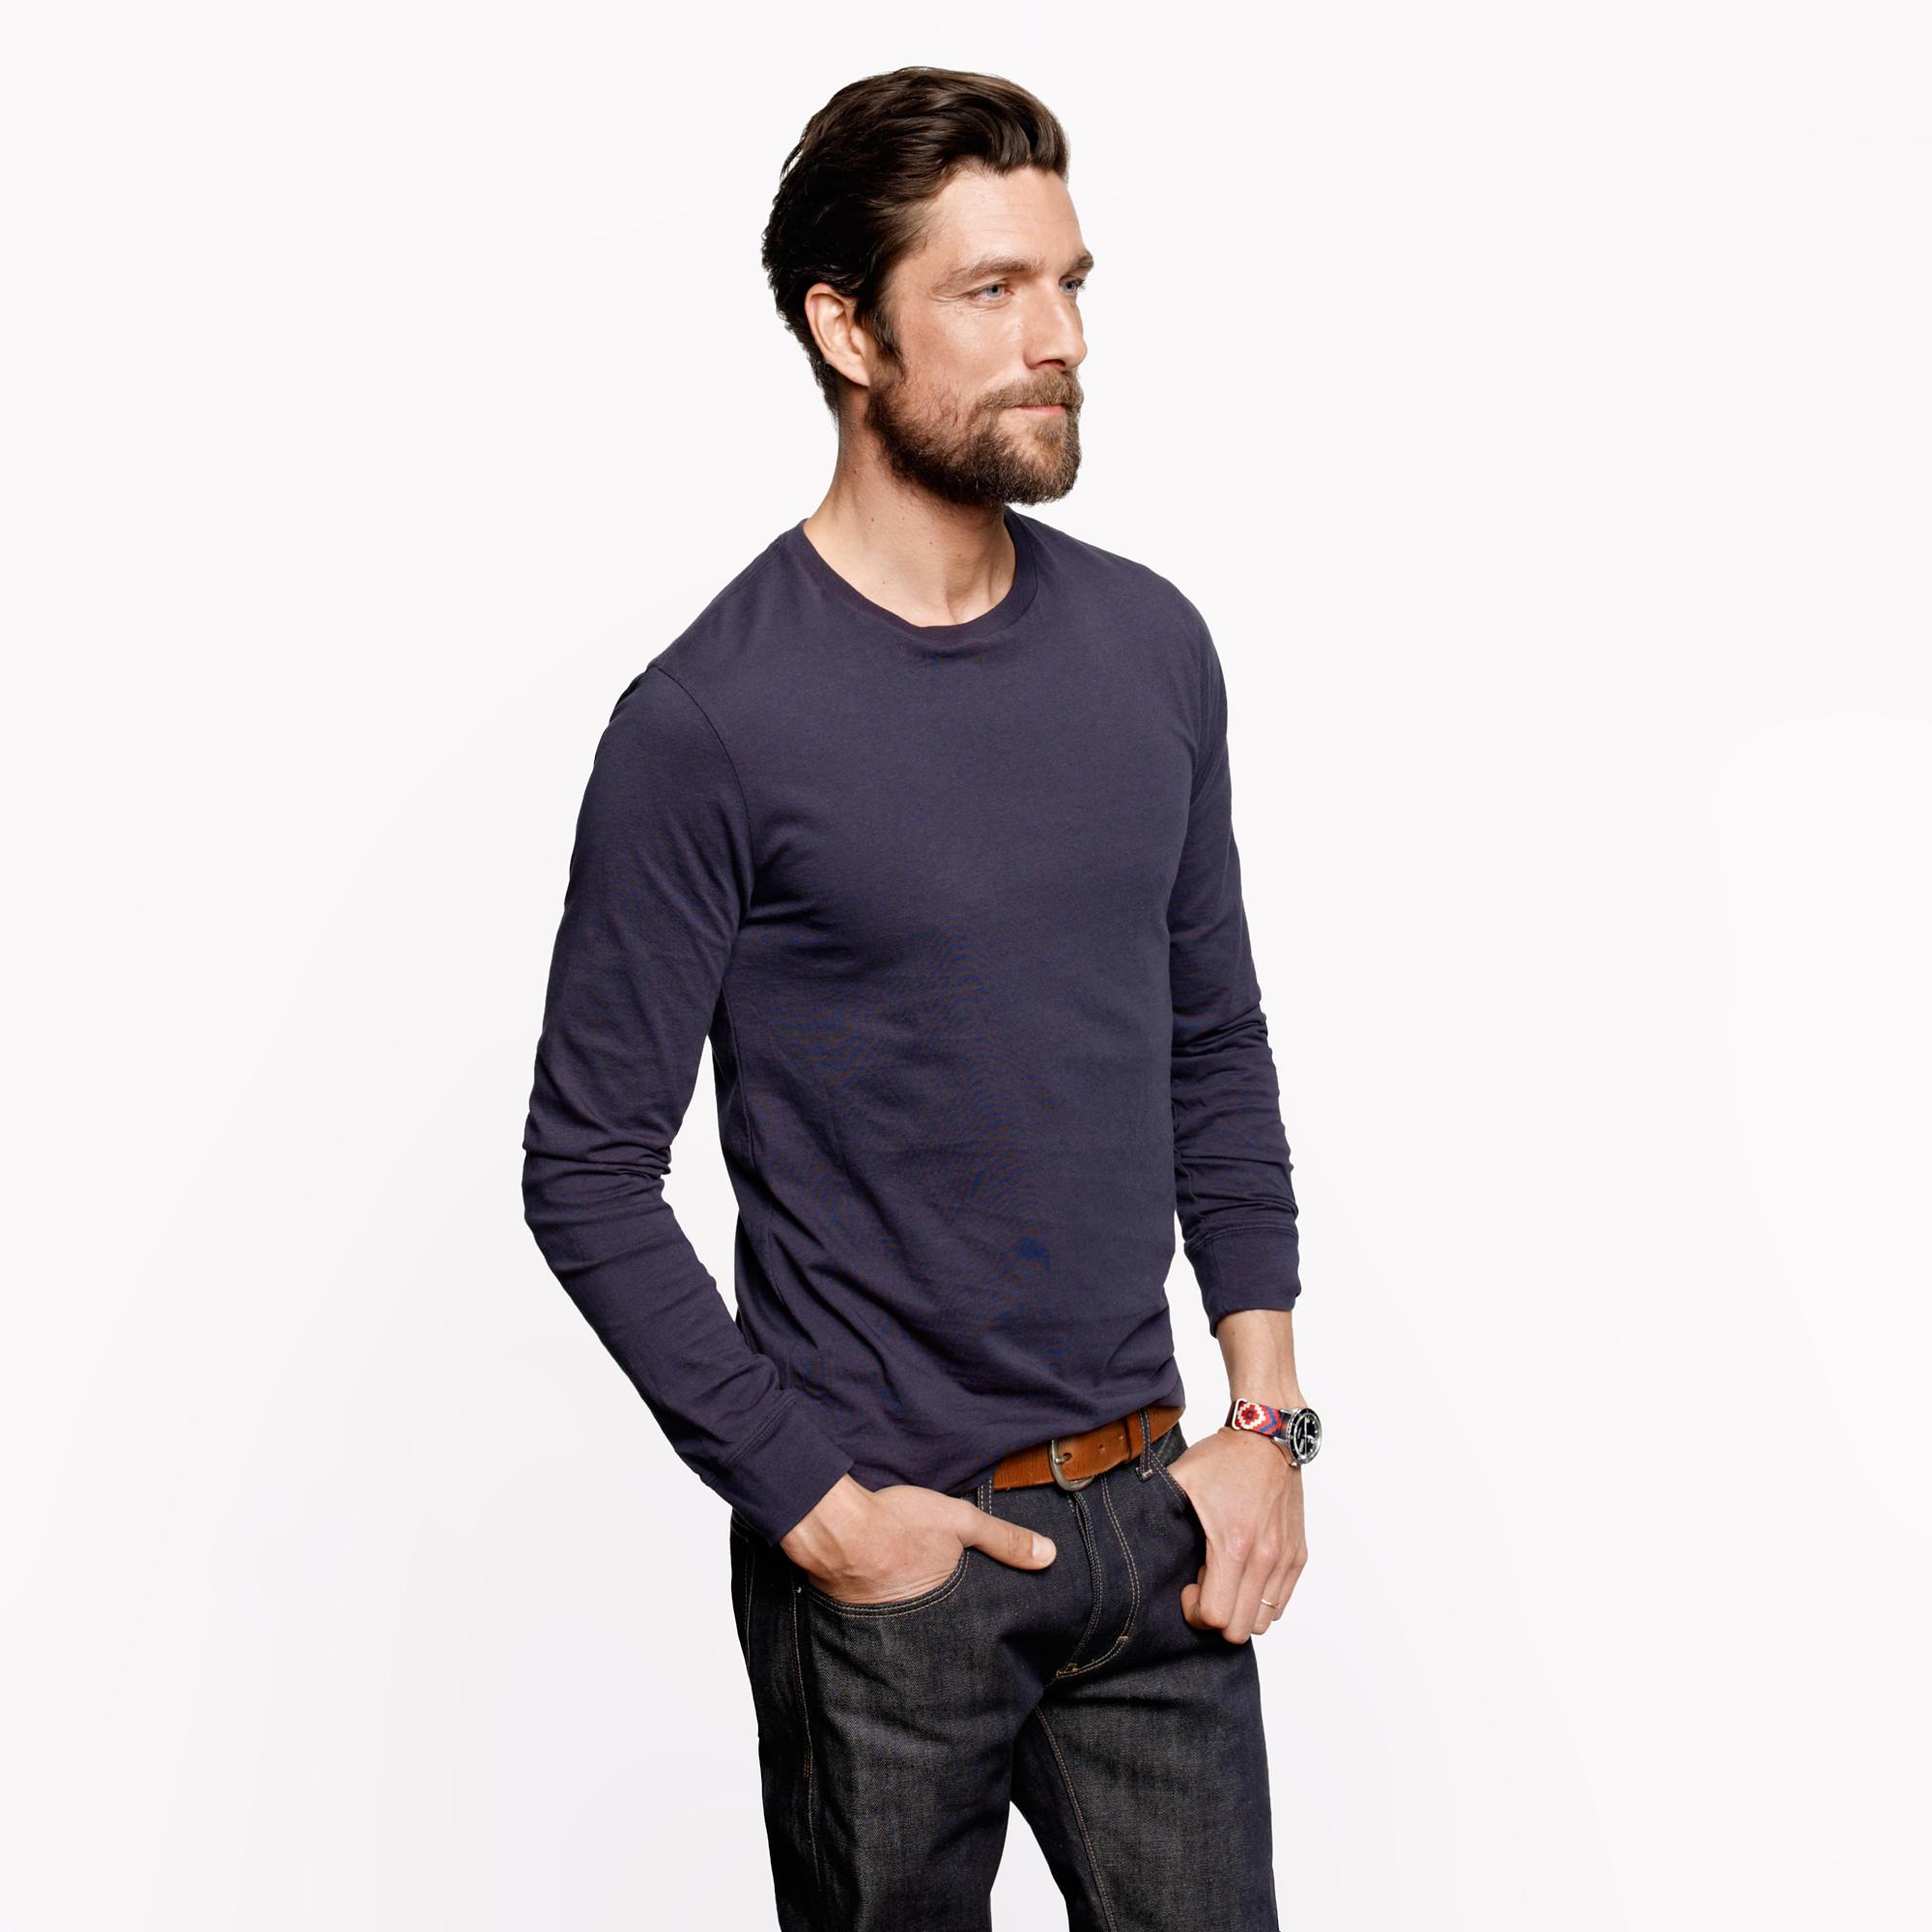 Tall Broken-In Long-Sleeve T-Shirt : Men's Tees | J.Crew